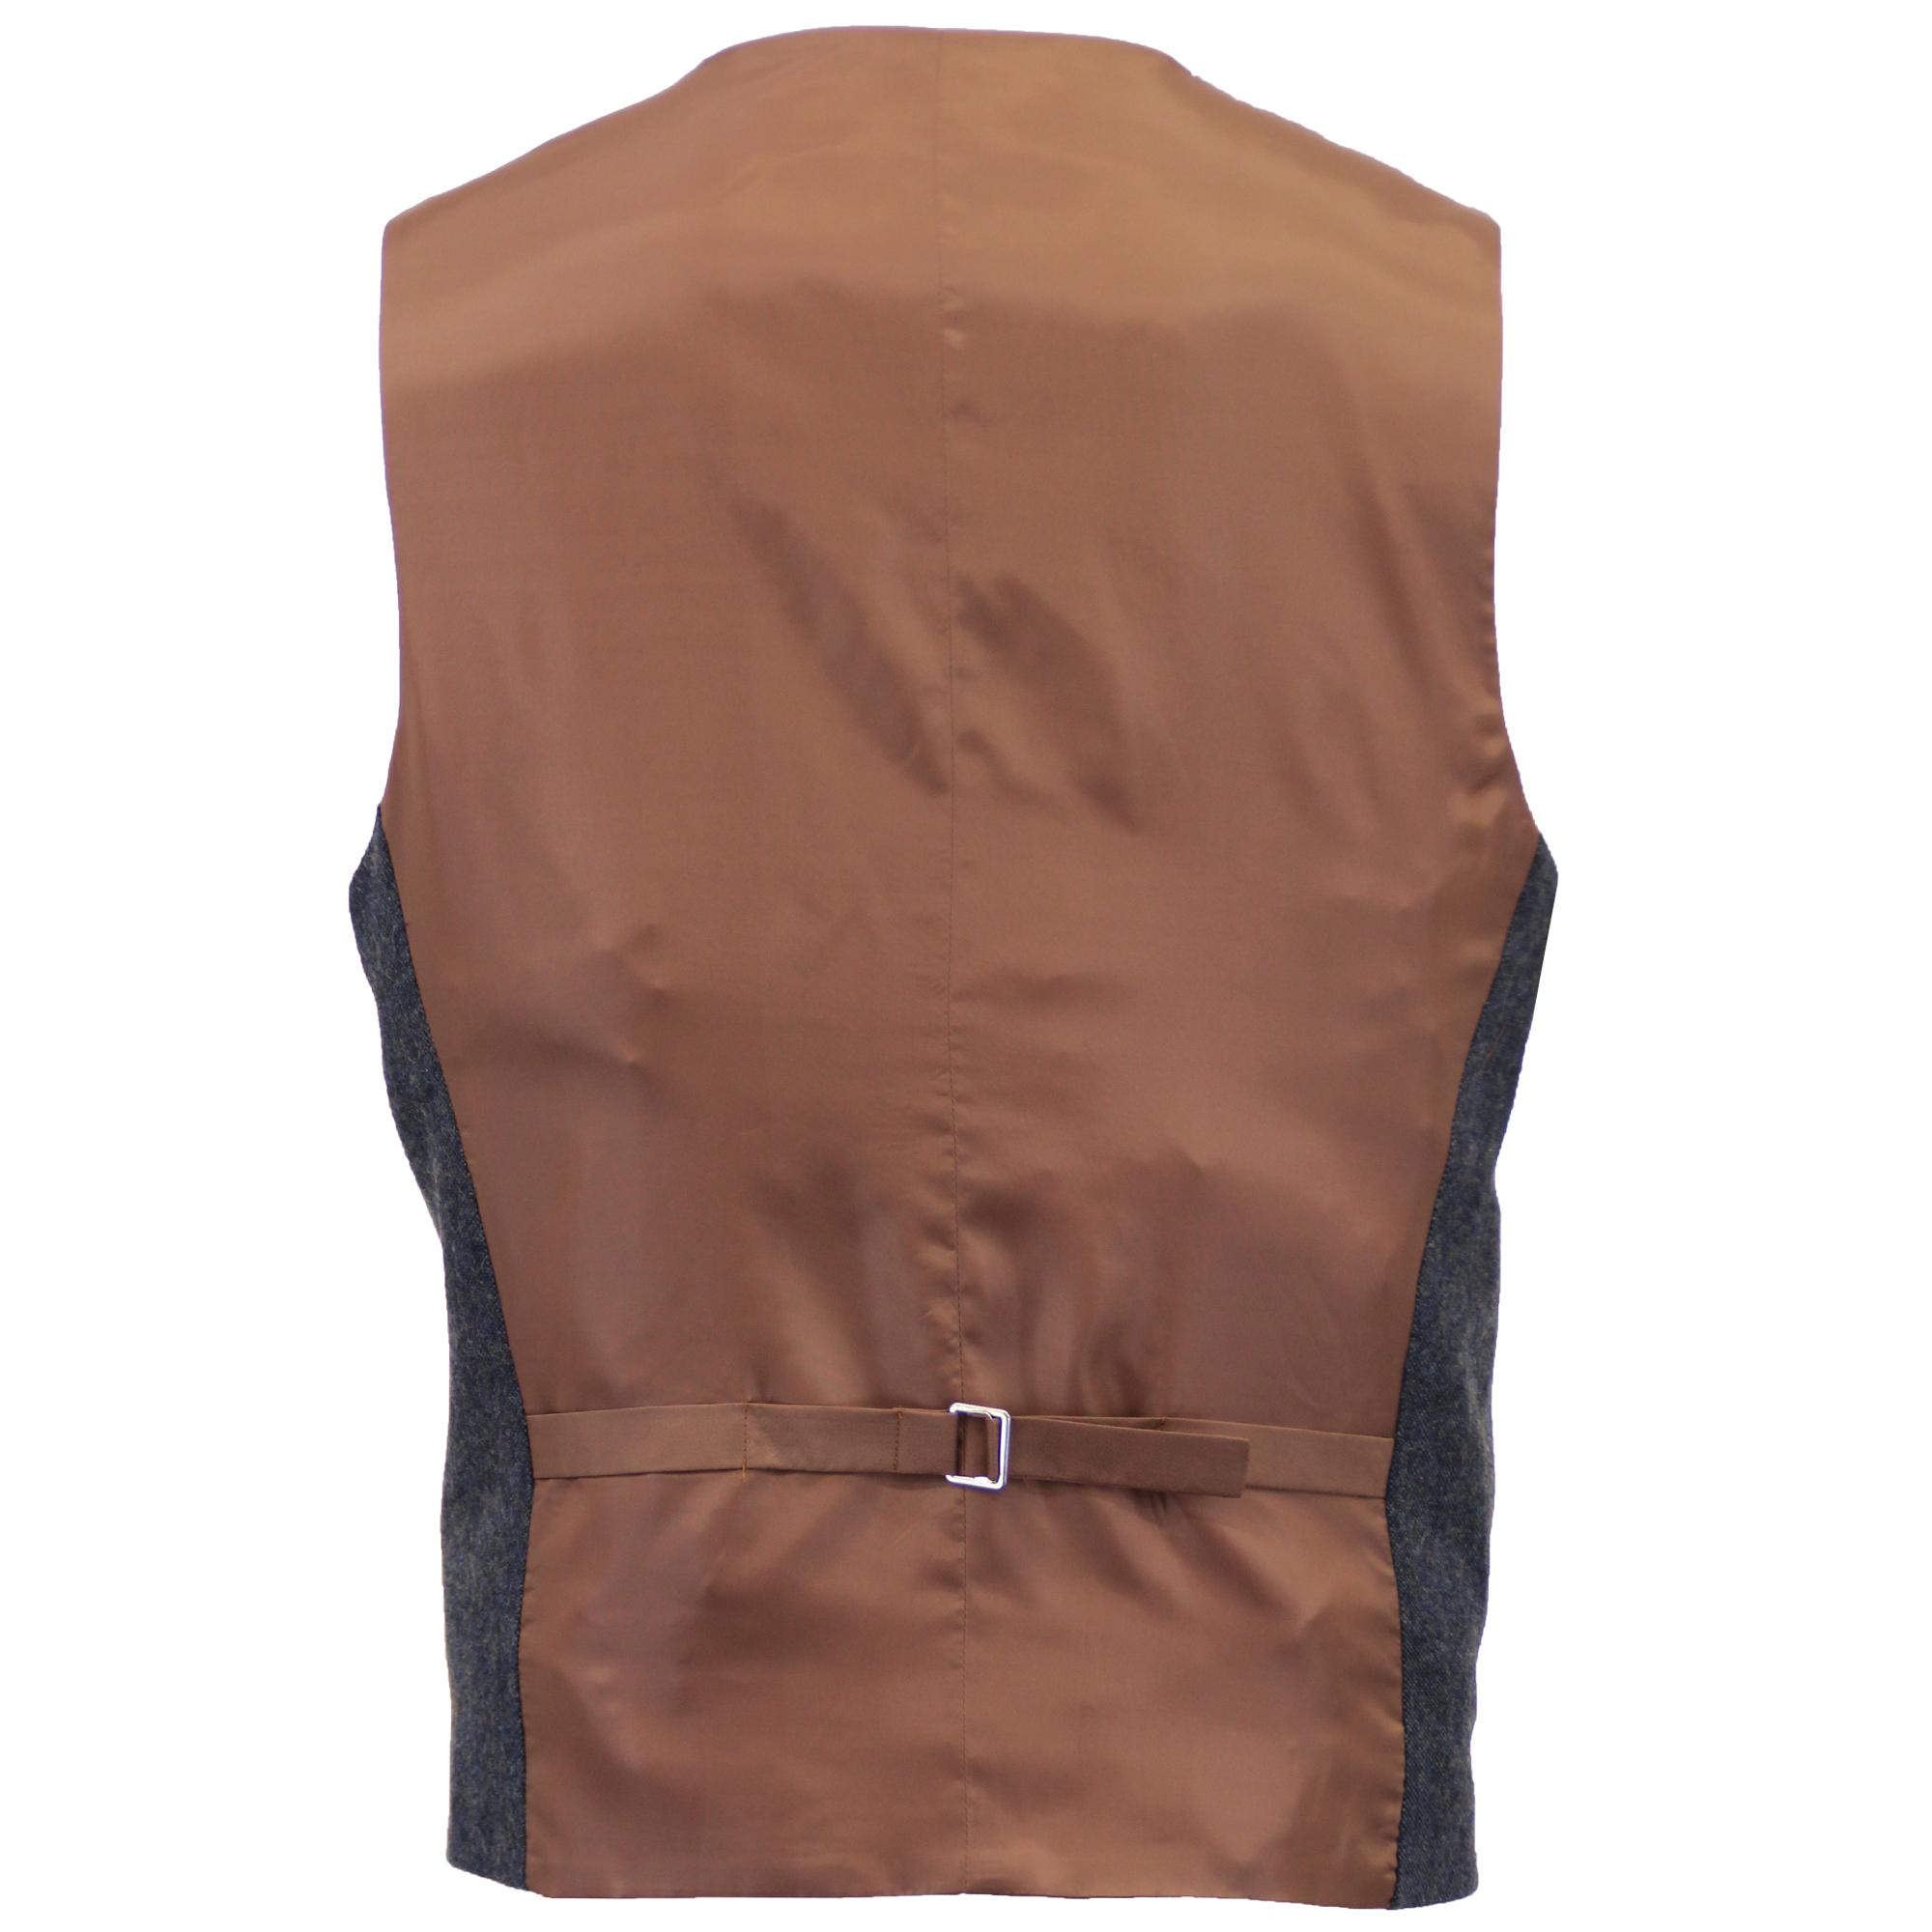 Mezcla-de-lana-para-hombre-3-piezas-trajes-mareno-Blazer-Chaqueta-pantalones-chaleco-Fiesta-Formal miniatura 13